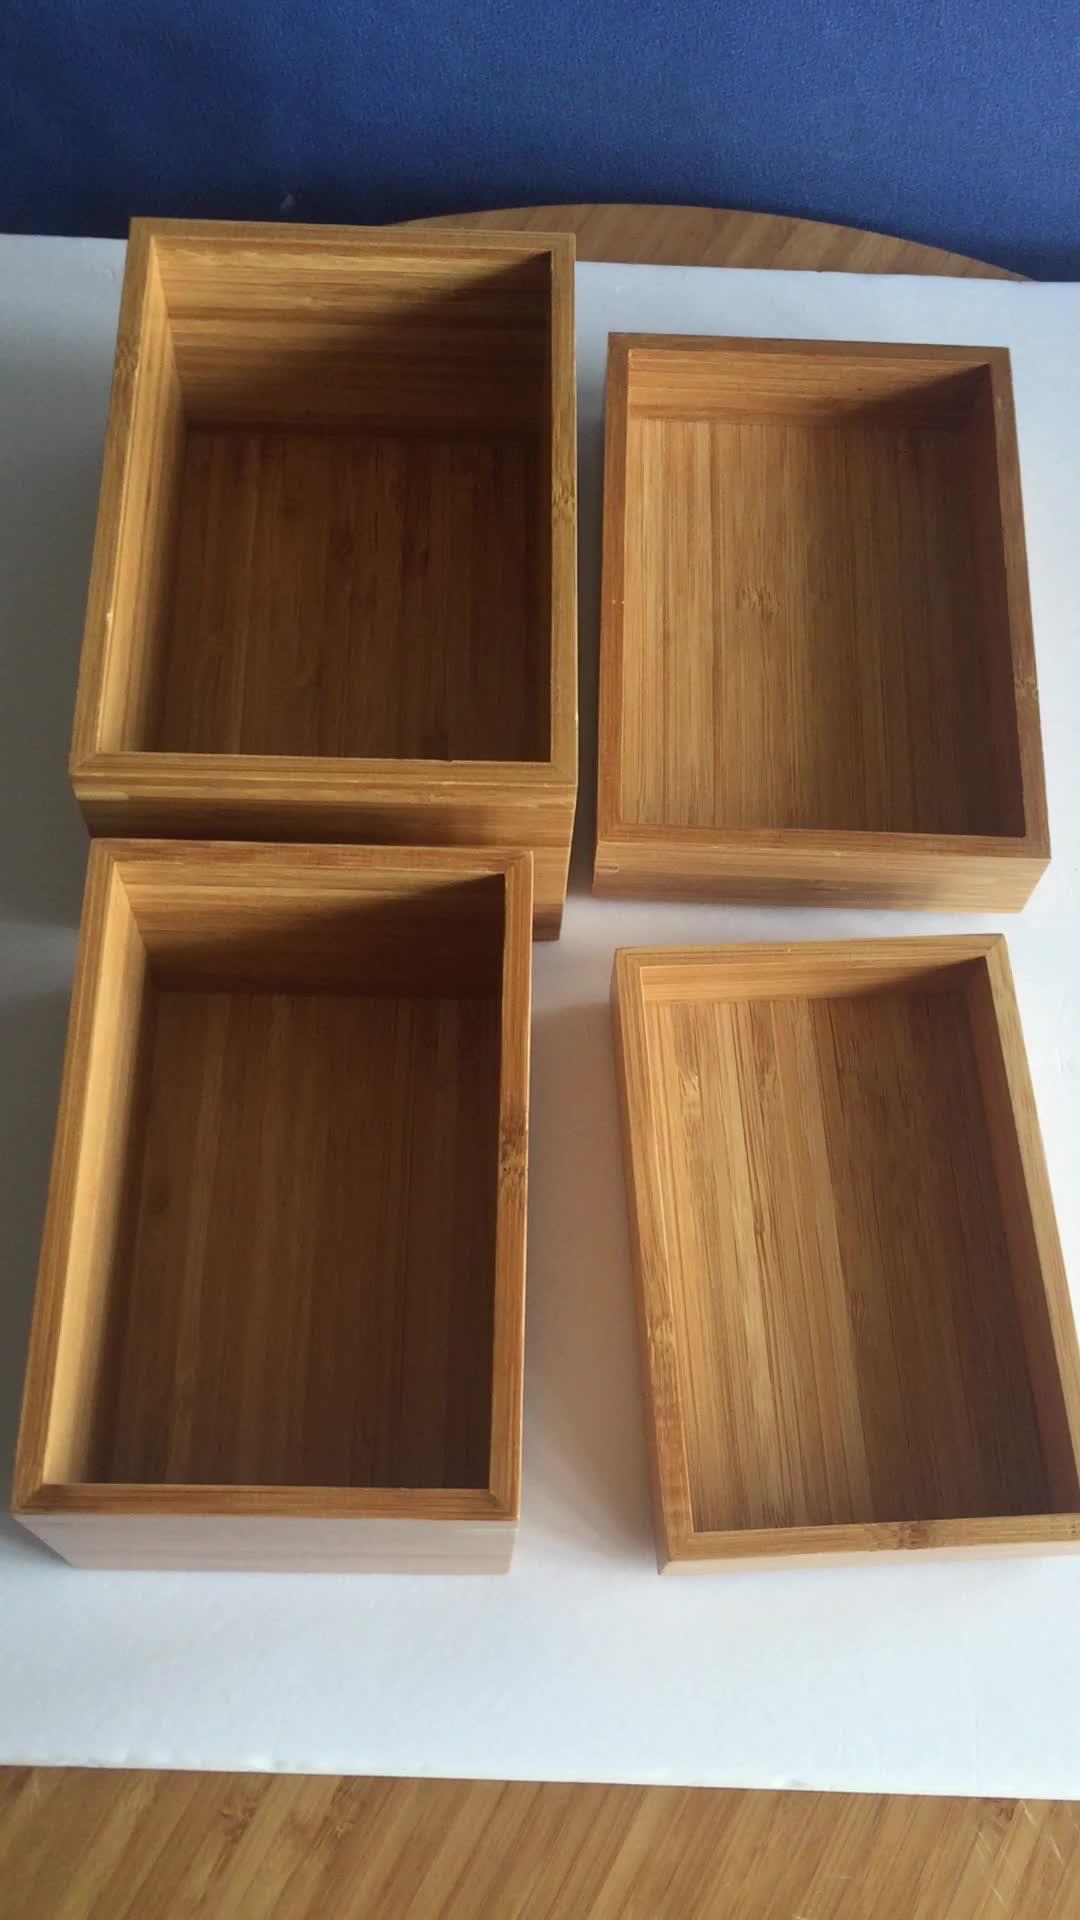 BAMBKIN home 4 pcs desk organizer bsci bamboo desktop storage box